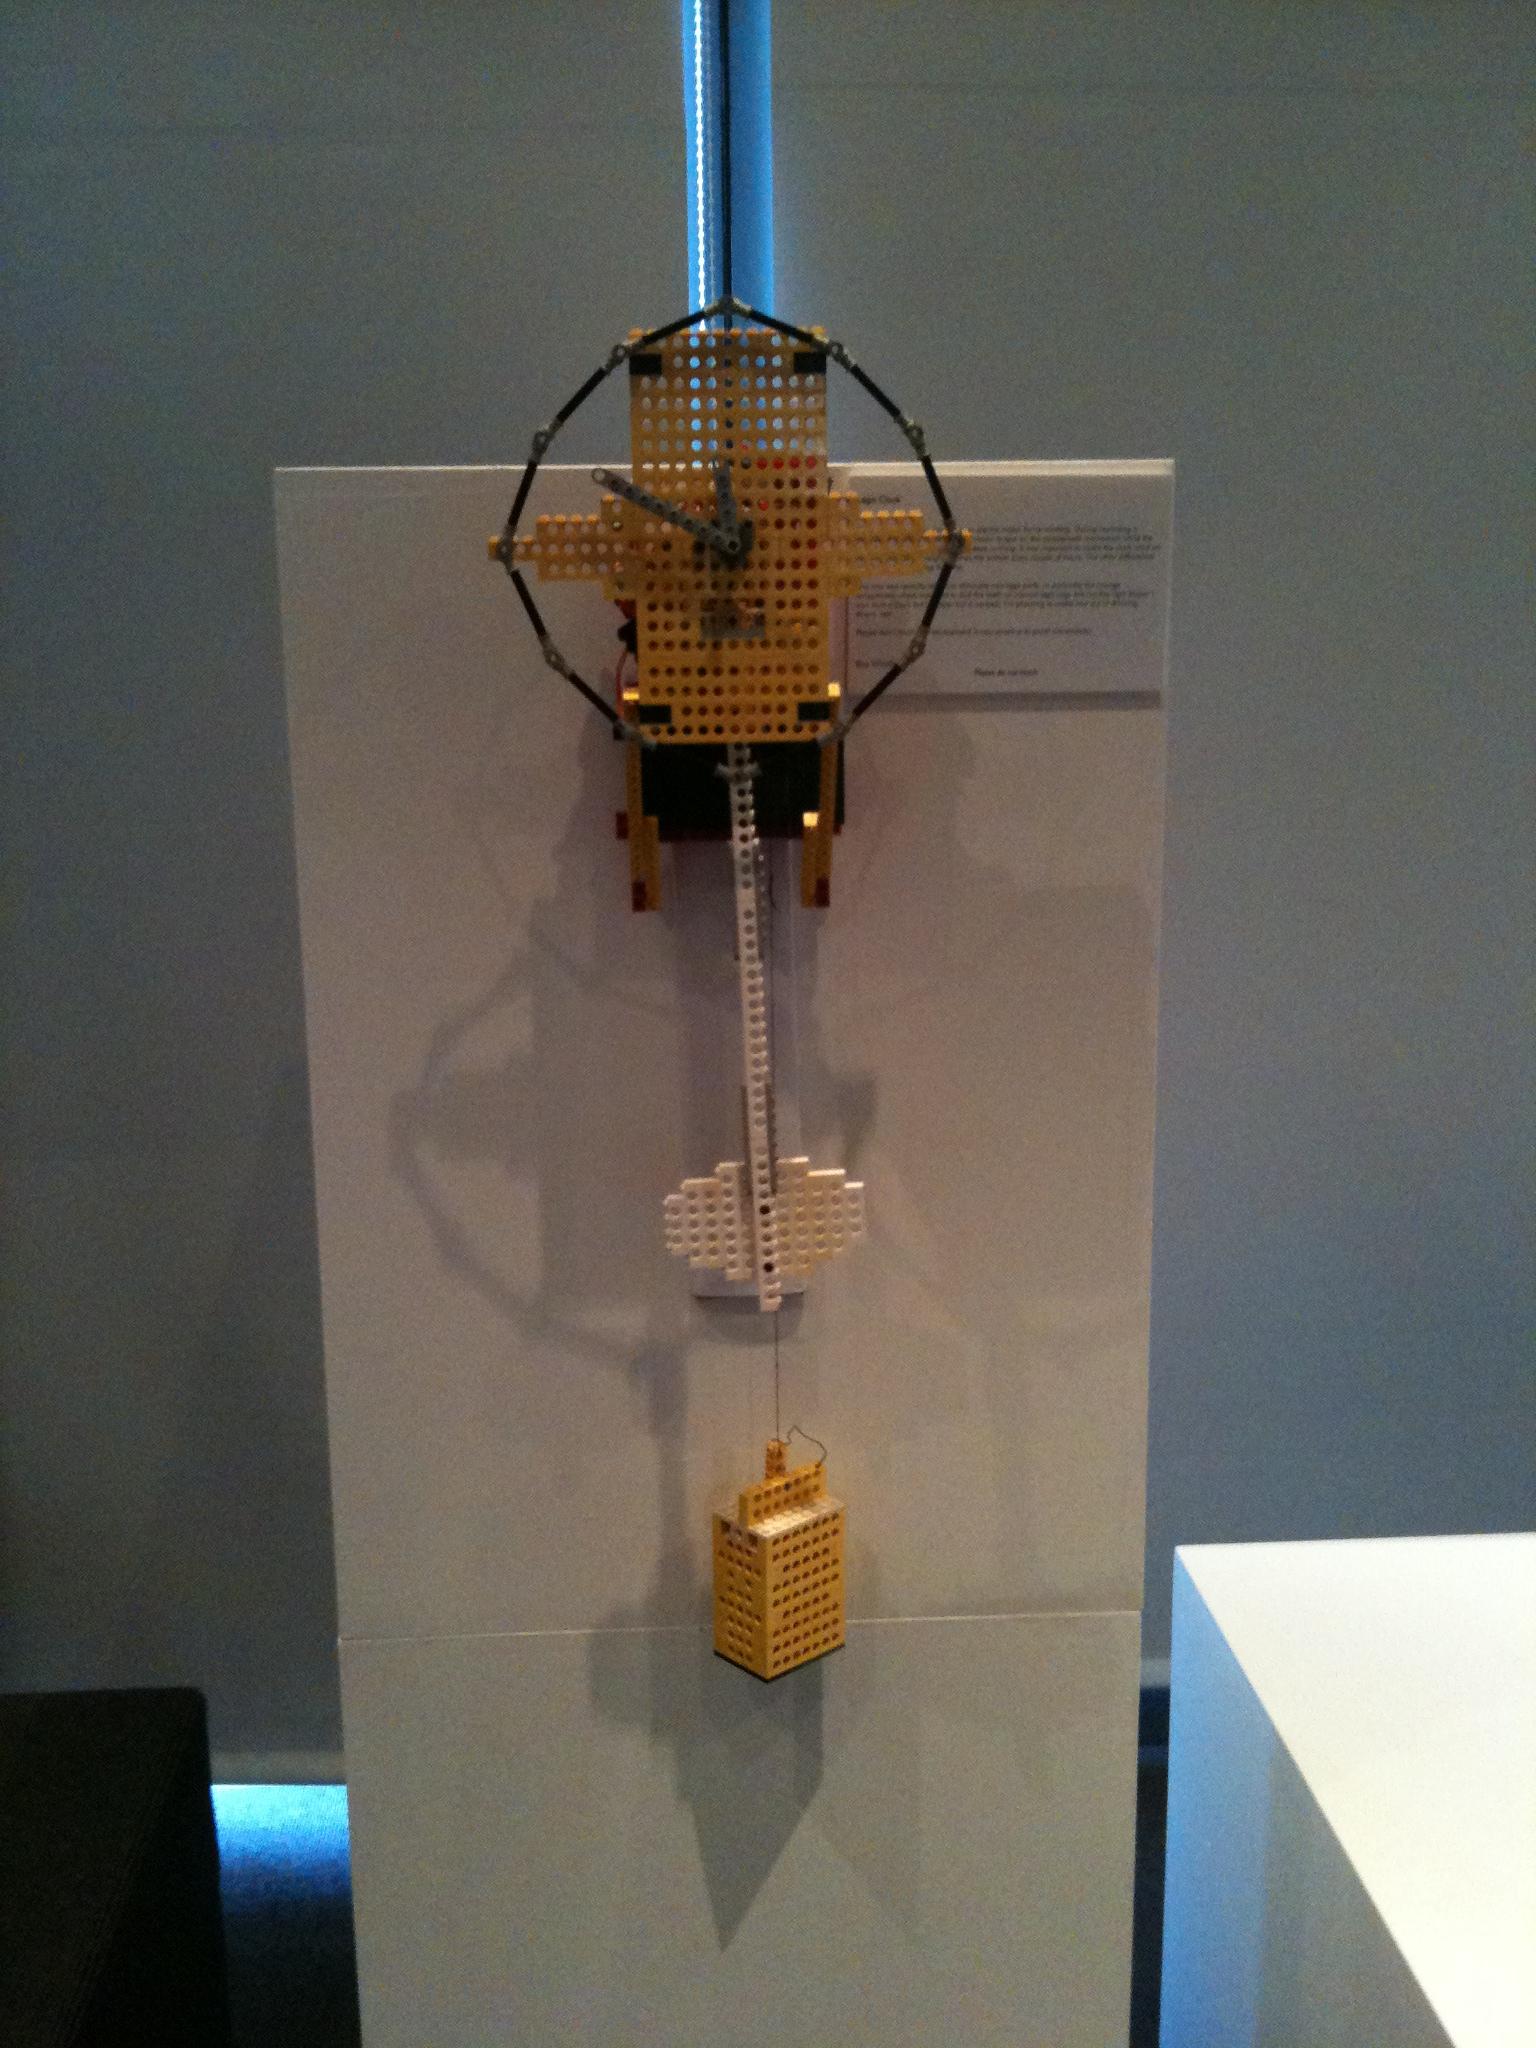 Lego Clock Gallery